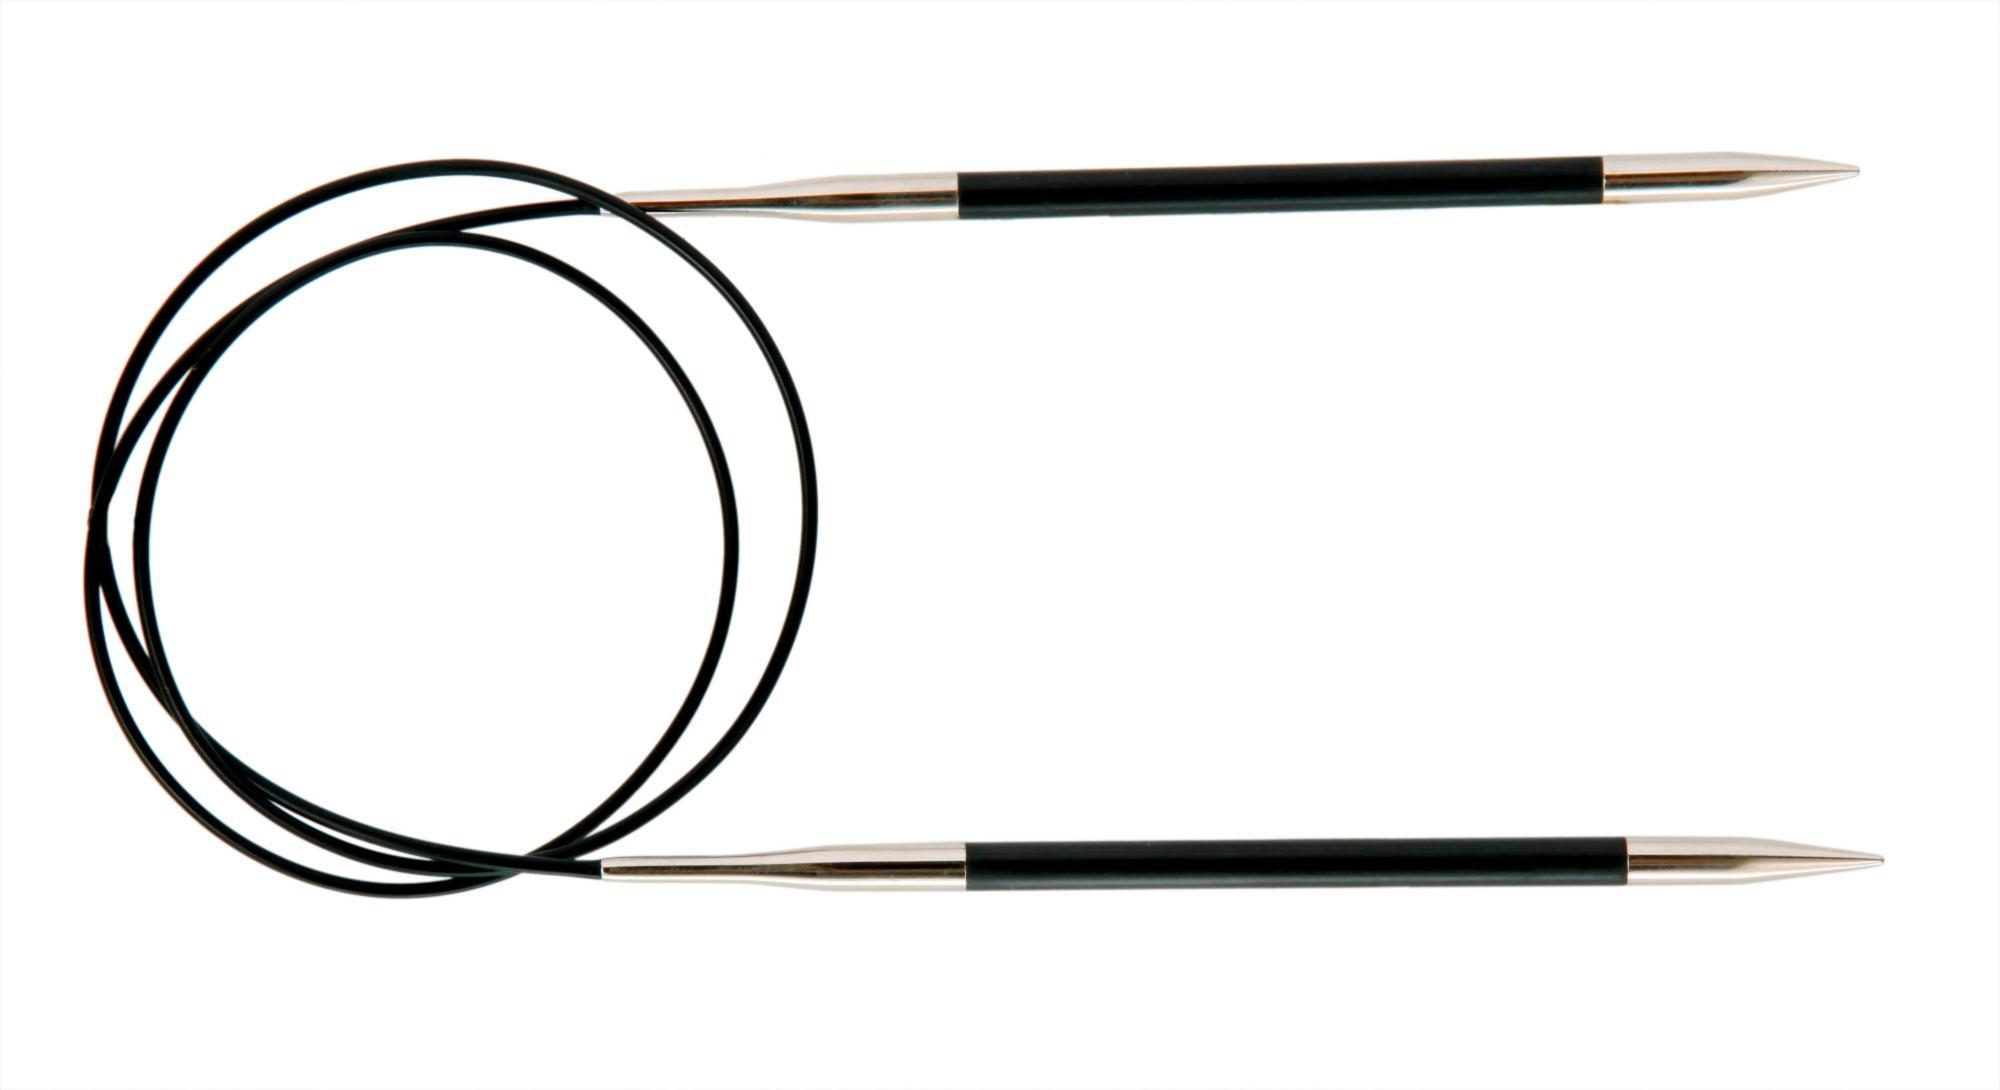 Спицы круговые 40 см Karbonz KnitPro, 41147, 3.75 мм